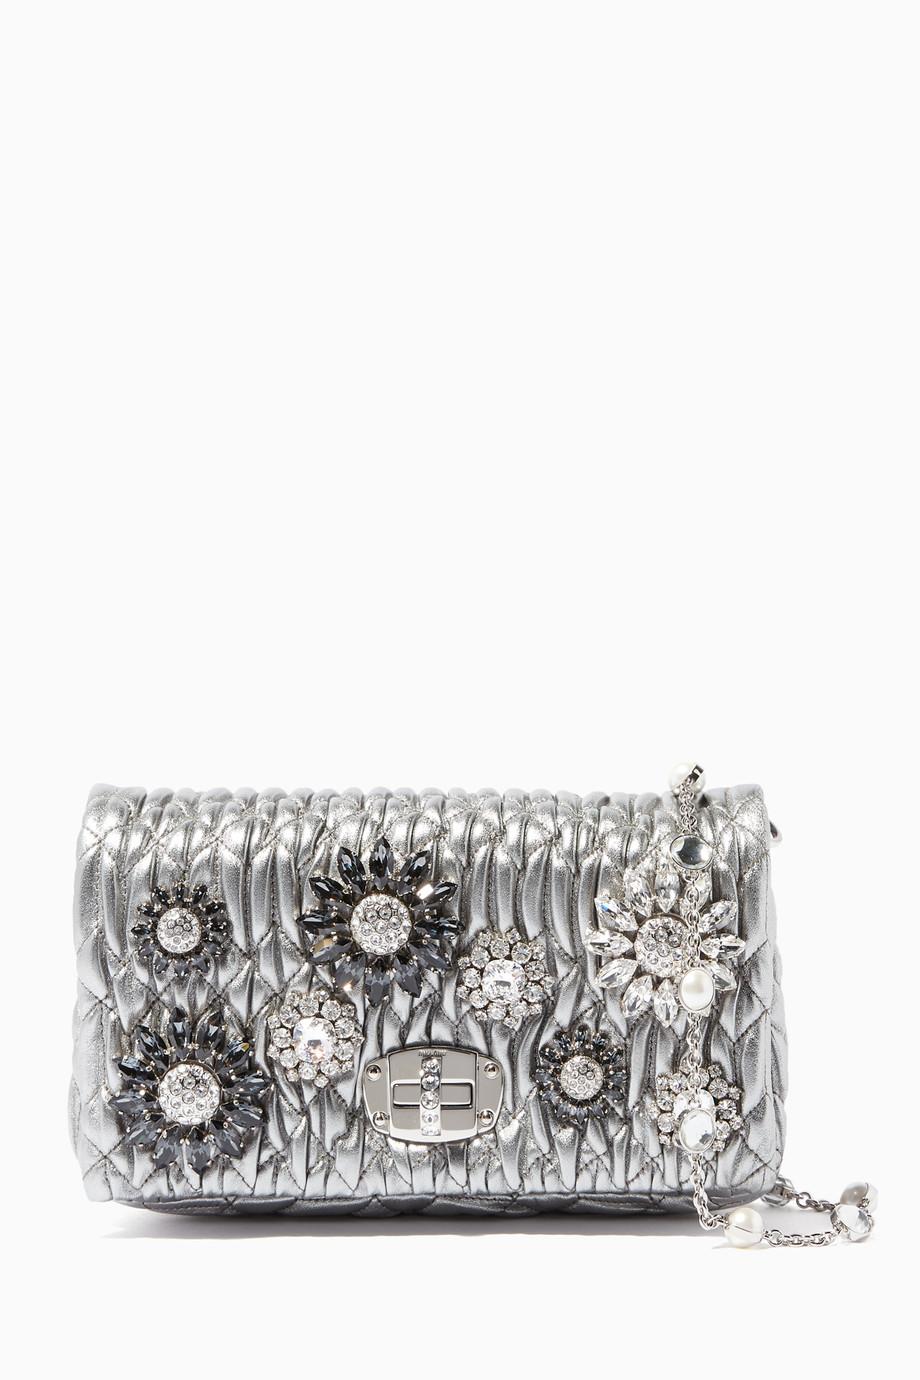 Shop Miu Miu Silver Silver Crystal-Embellished Shoulder Bag for ... dfc17b794e853